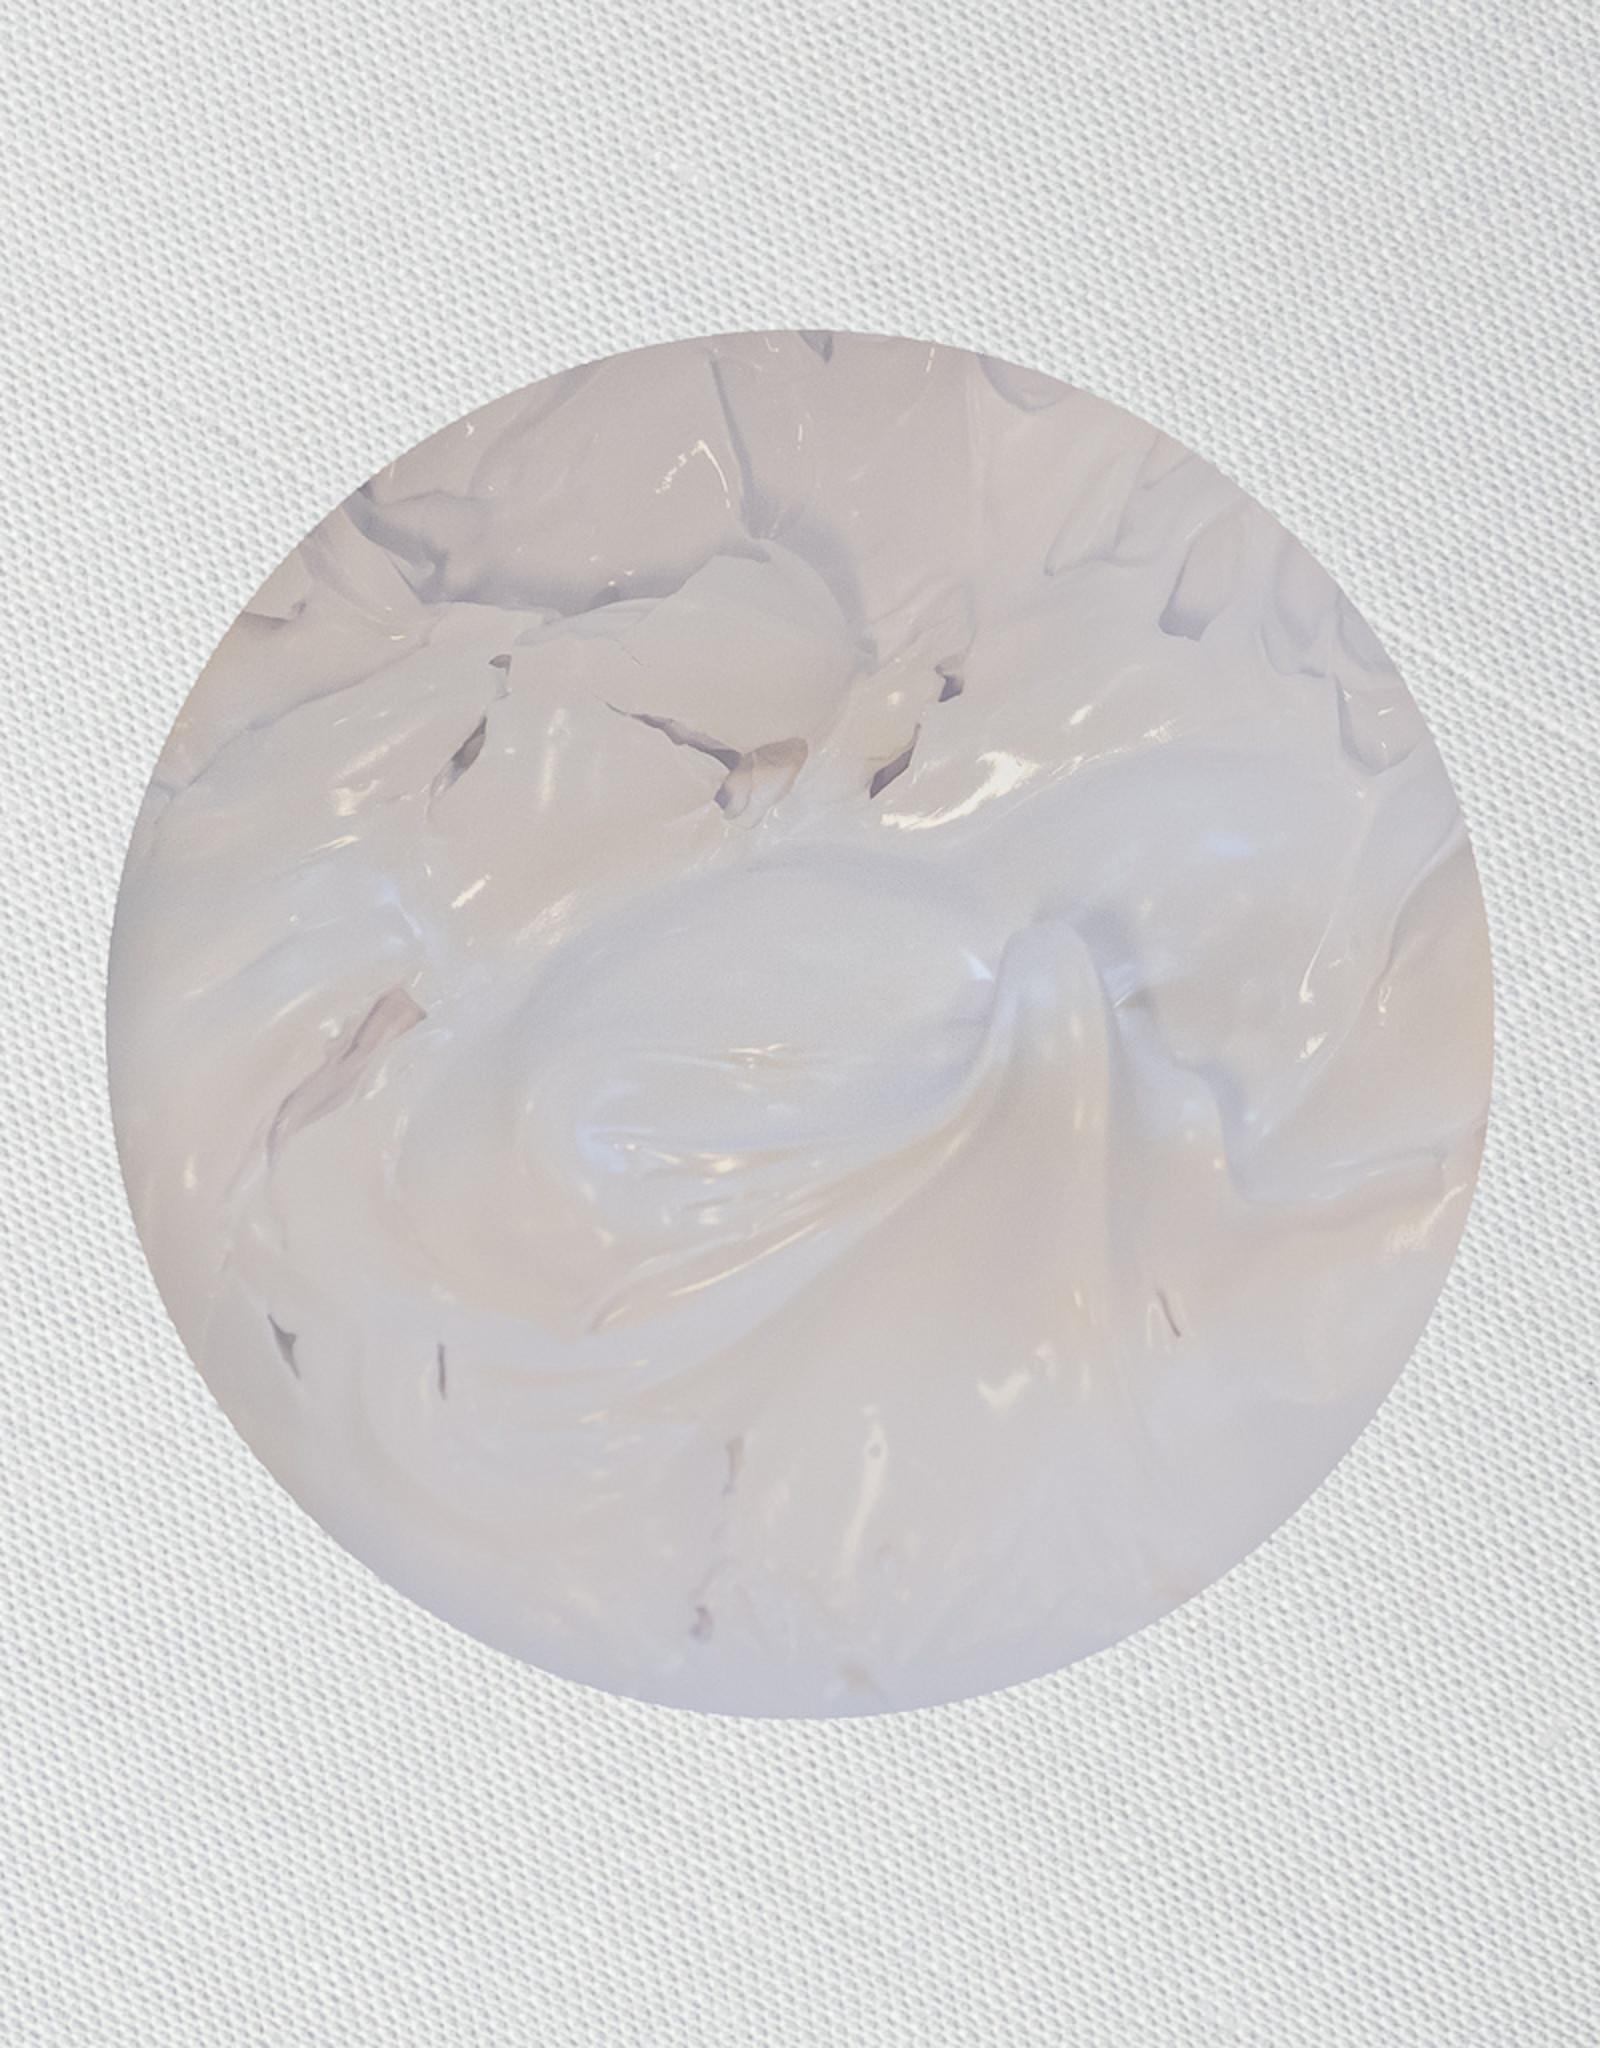 Trapsuutjies White Large